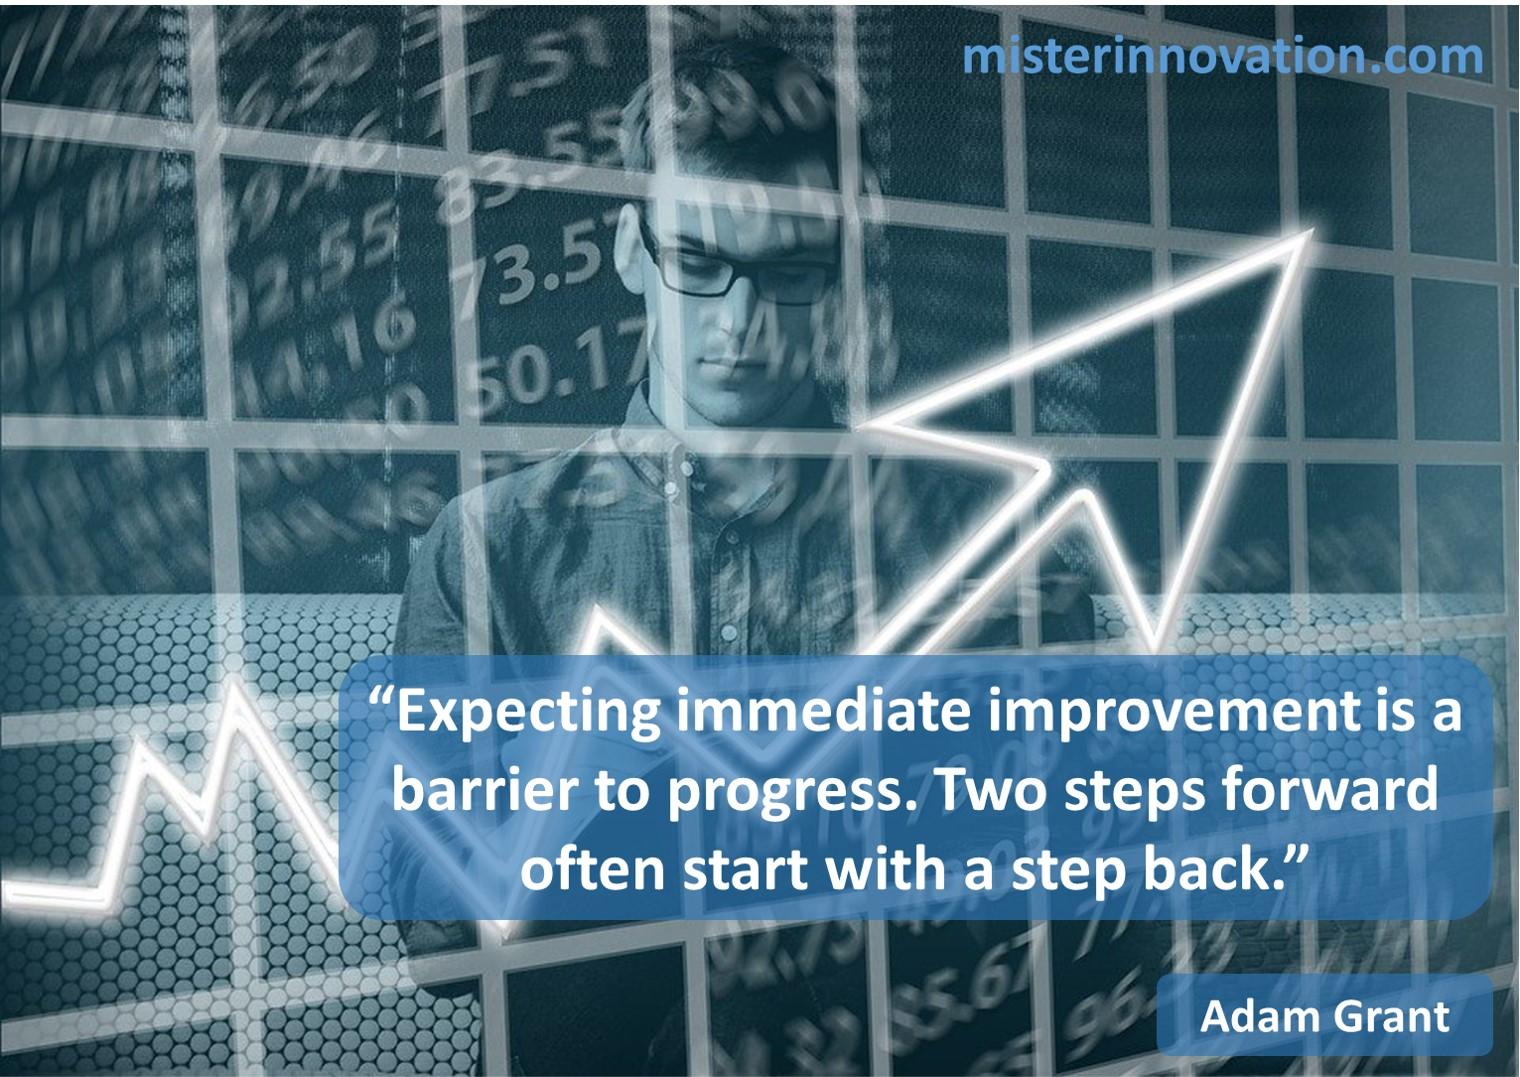 Adam Grant Barrier to Progress